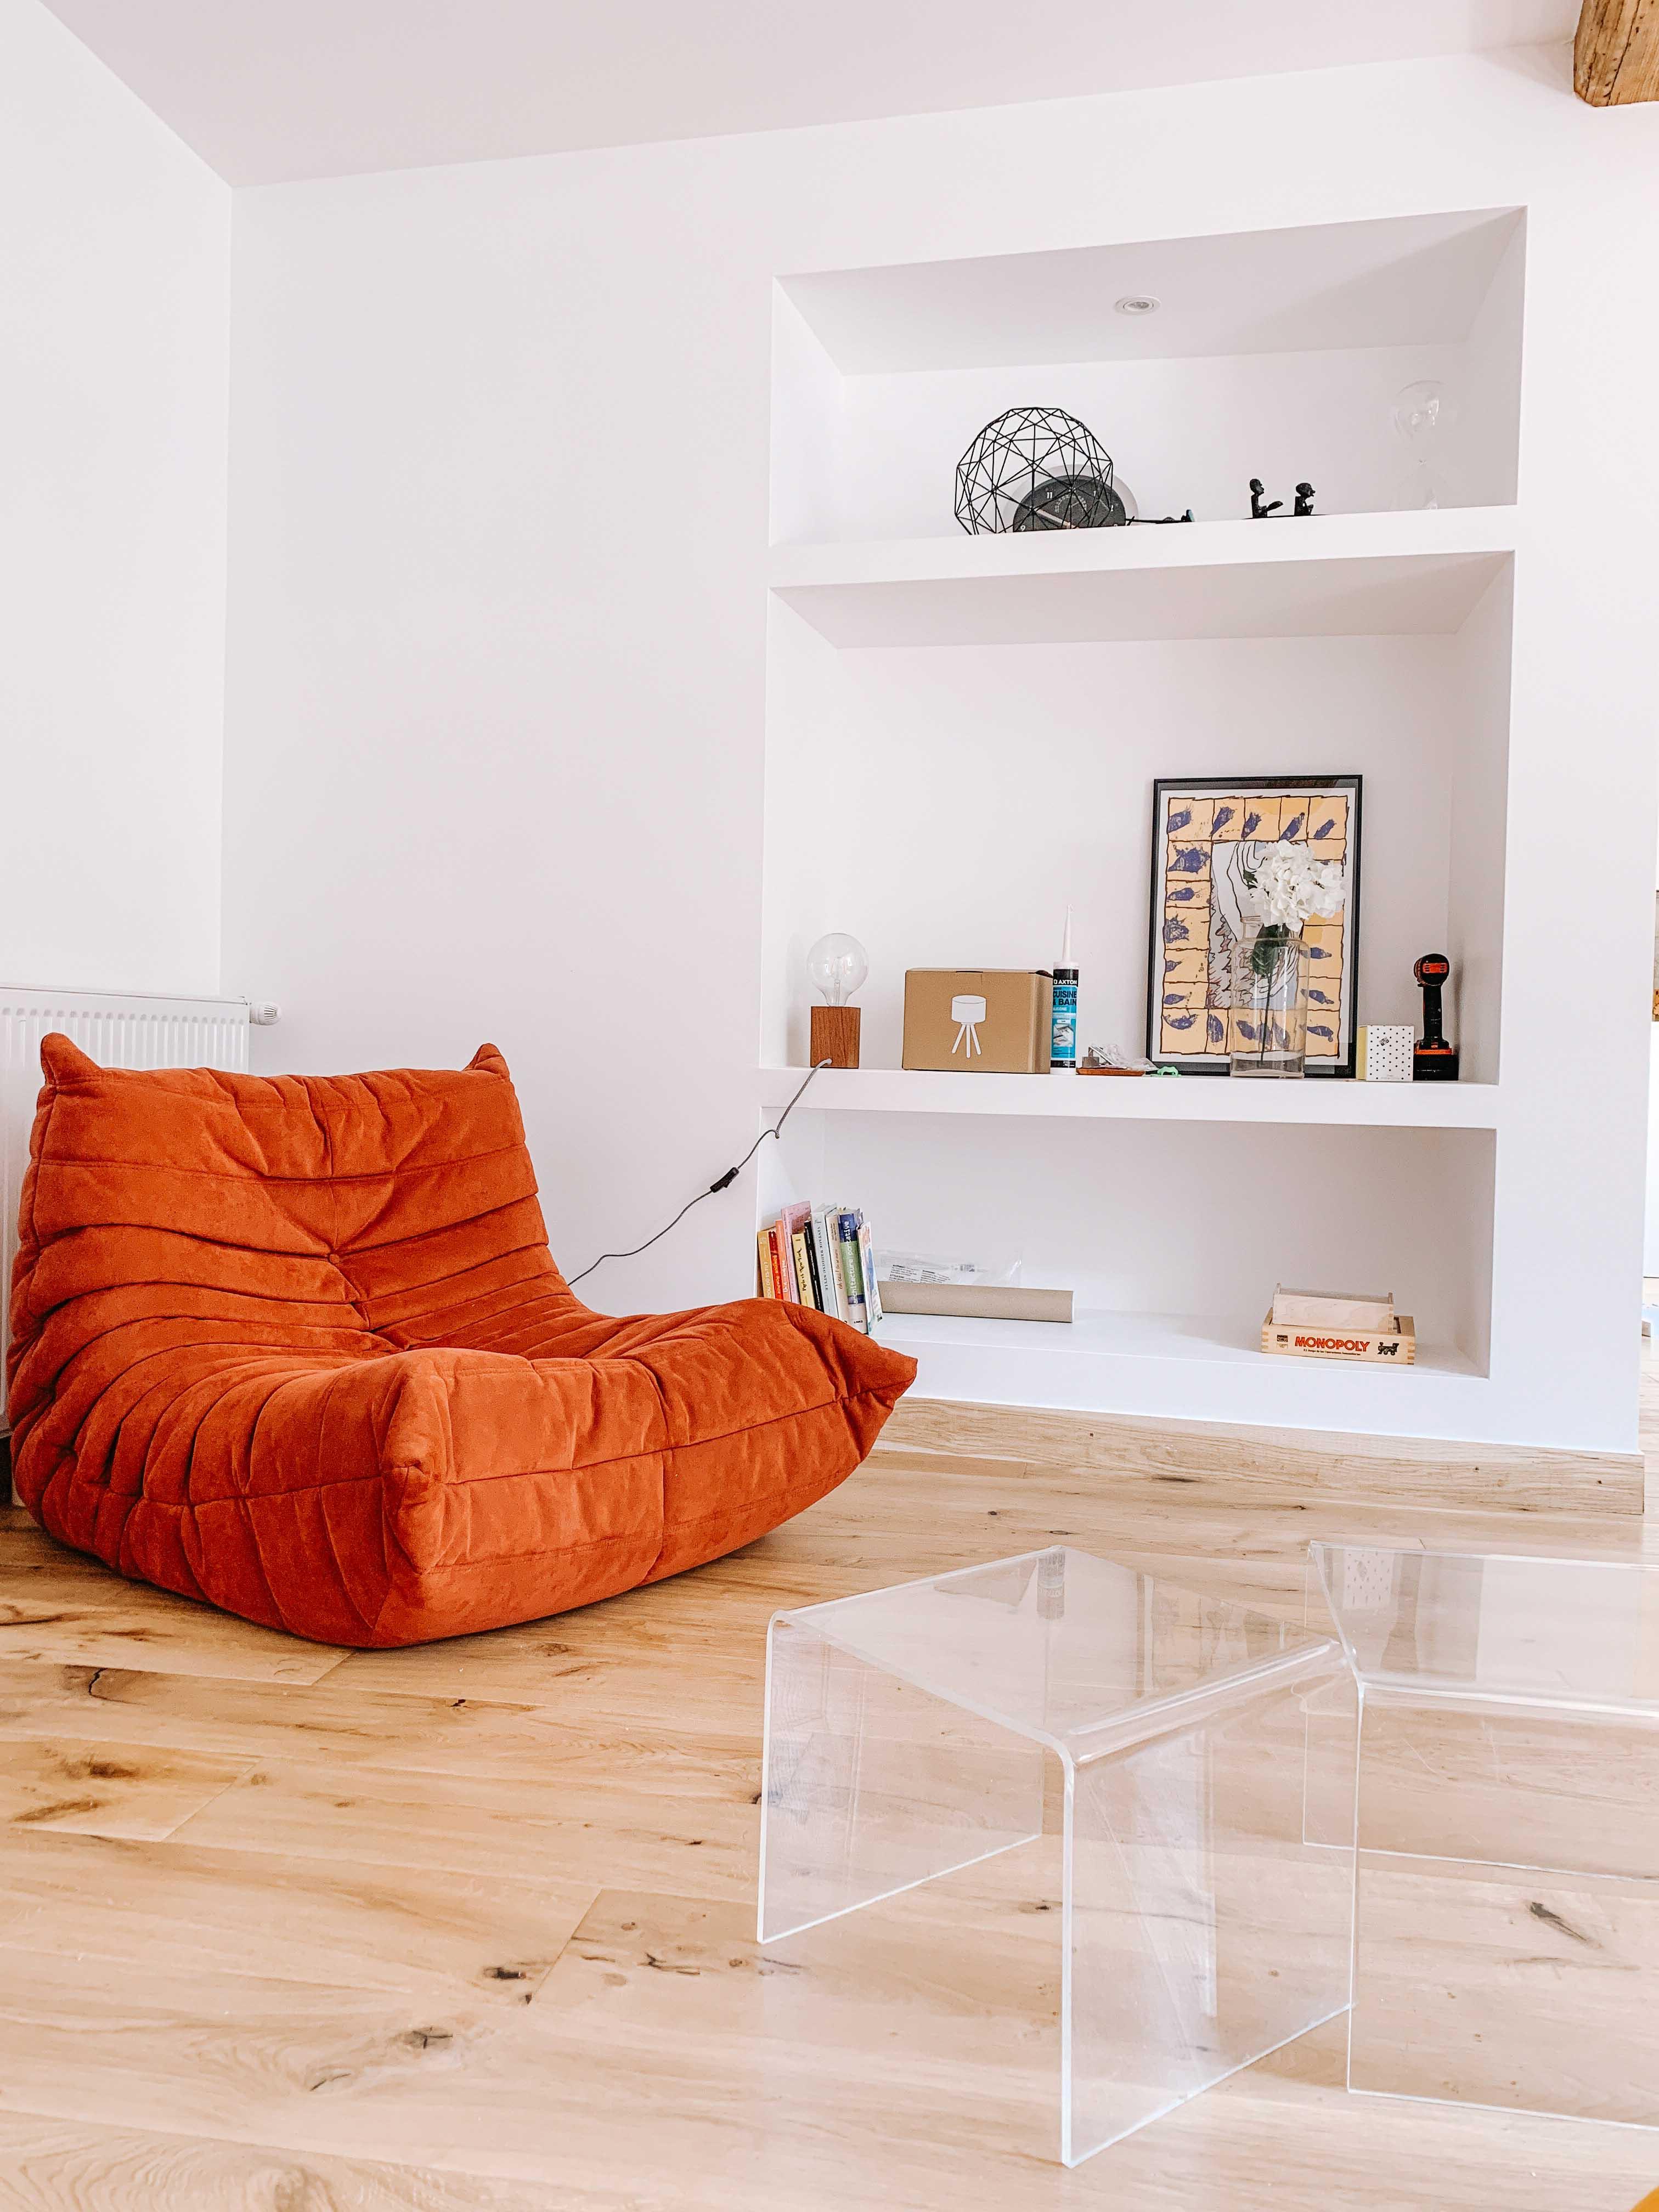 architecte-lyon-rénovation-presbytere-marcilly-azergues-pierre-dorée-12